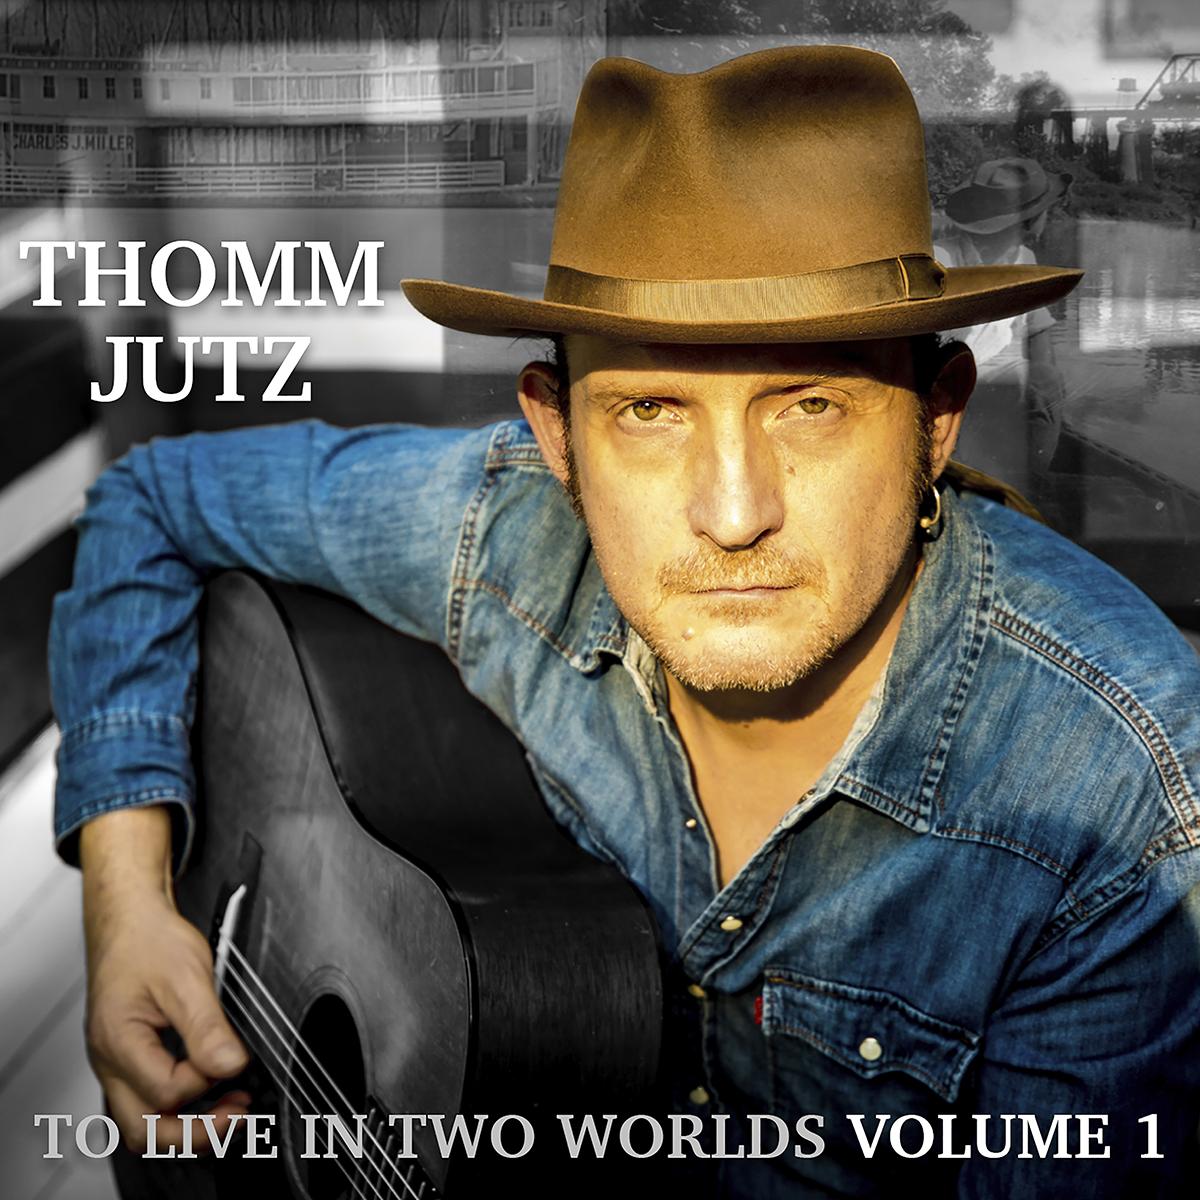 Thomm Jutz | To Live in Two Worlds Volume 1